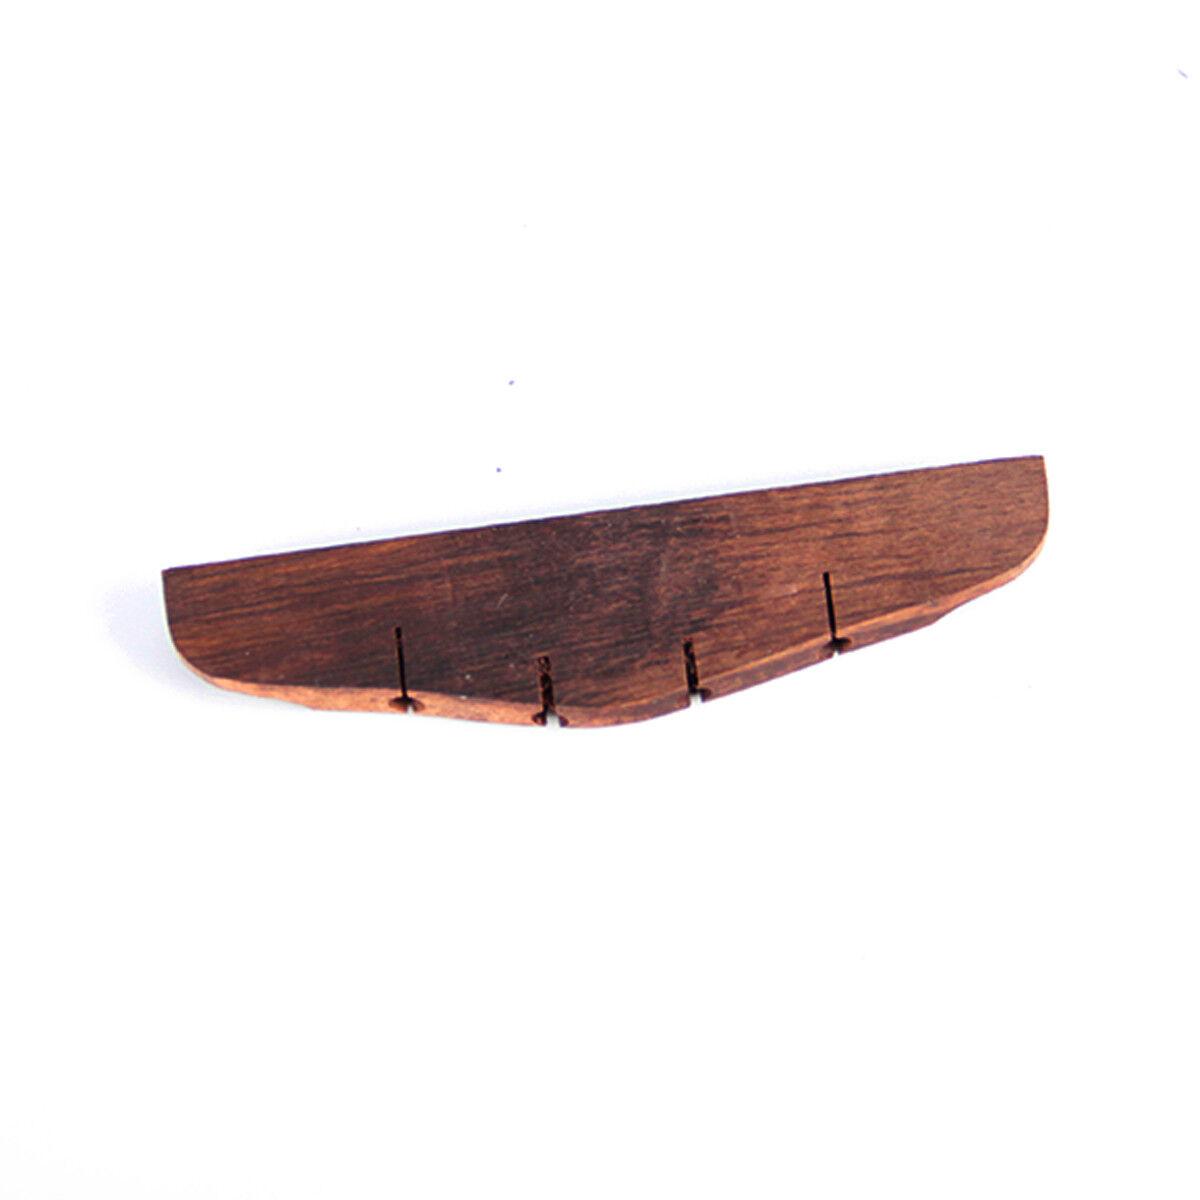 ukulele bridge for uke ukelele hawaii guitar parts replacement slotted 634458768153 ebay. Black Bedroom Furniture Sets. Home Design Ideas